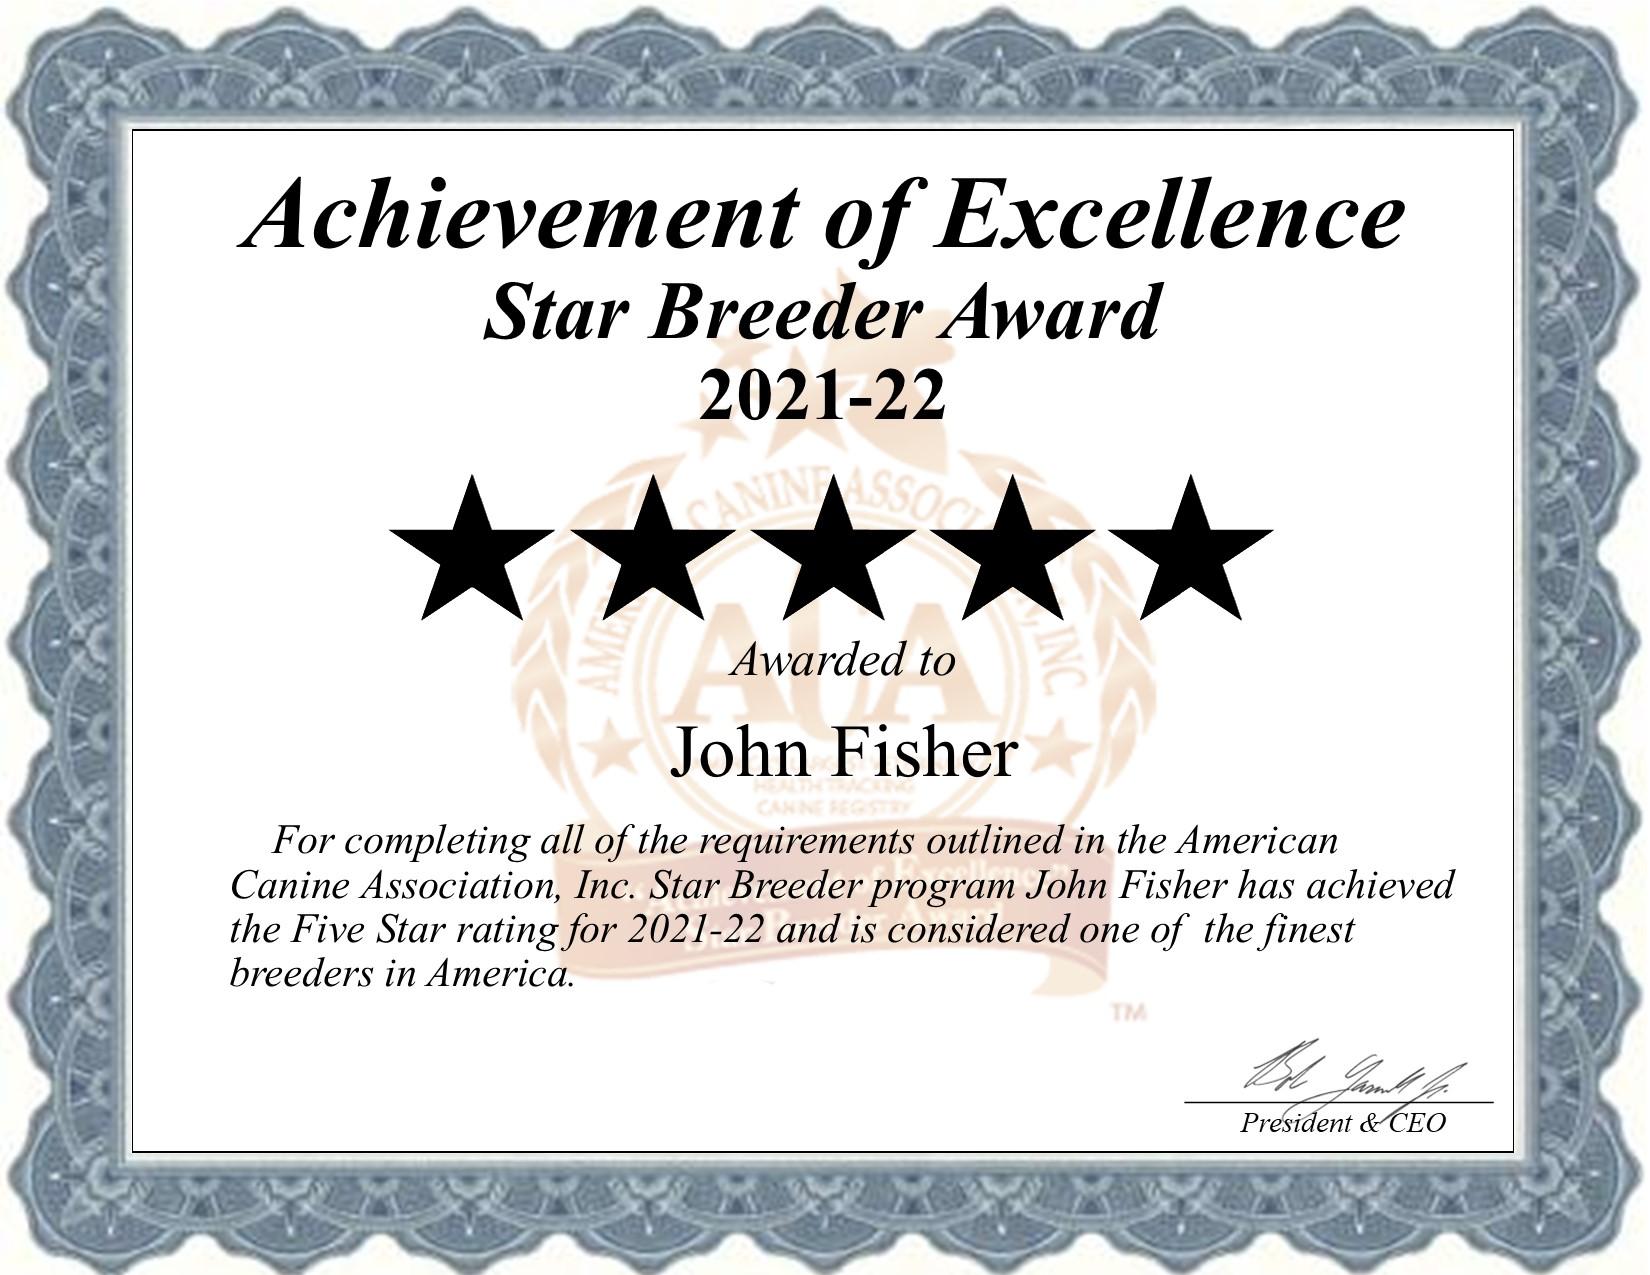 John, Fisher, dog, breeder, star, certificate, John-Fisher, Coatesville, PA, Pennsylvania, puppy, dog, kennels, mill, puppymill, usda, 5-star, aca, ica, registered, Doodle